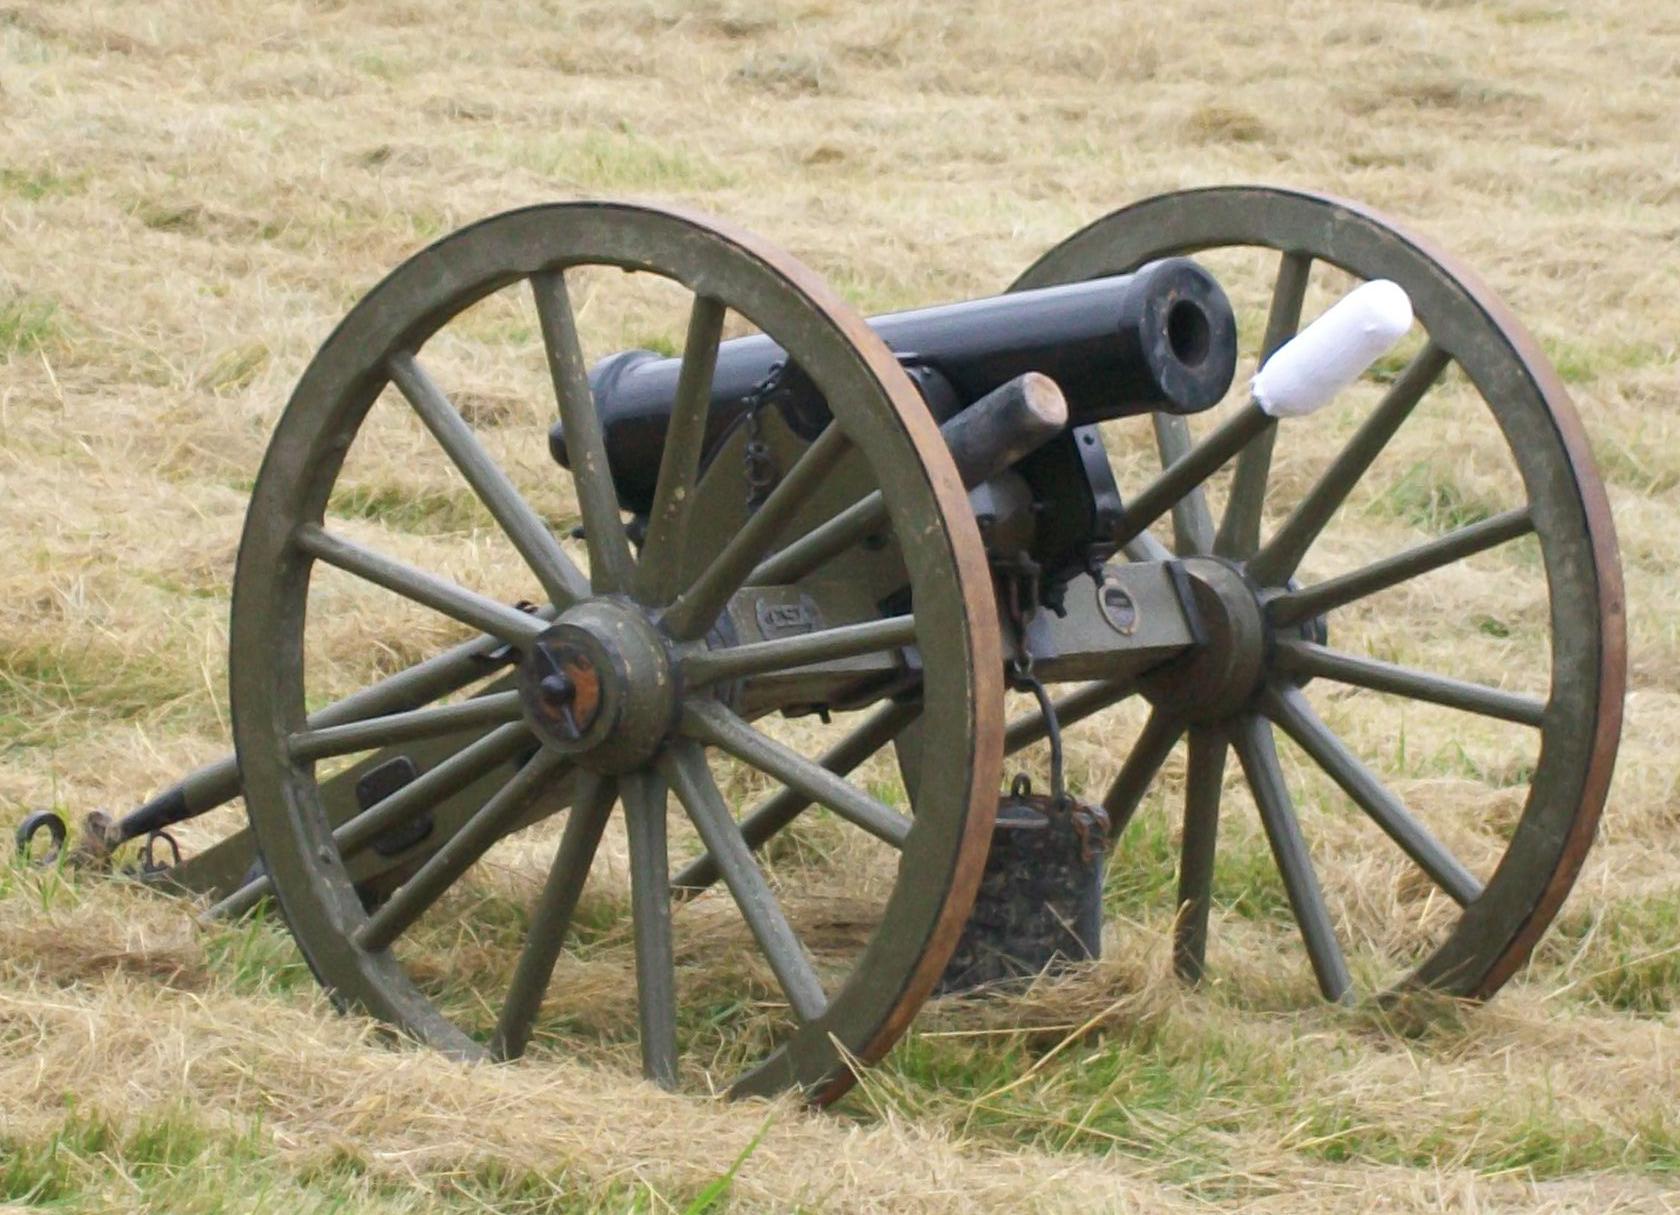 1680x1215 Fileamerican Civil War Era 12 Lb Howitzer Cannon Used In